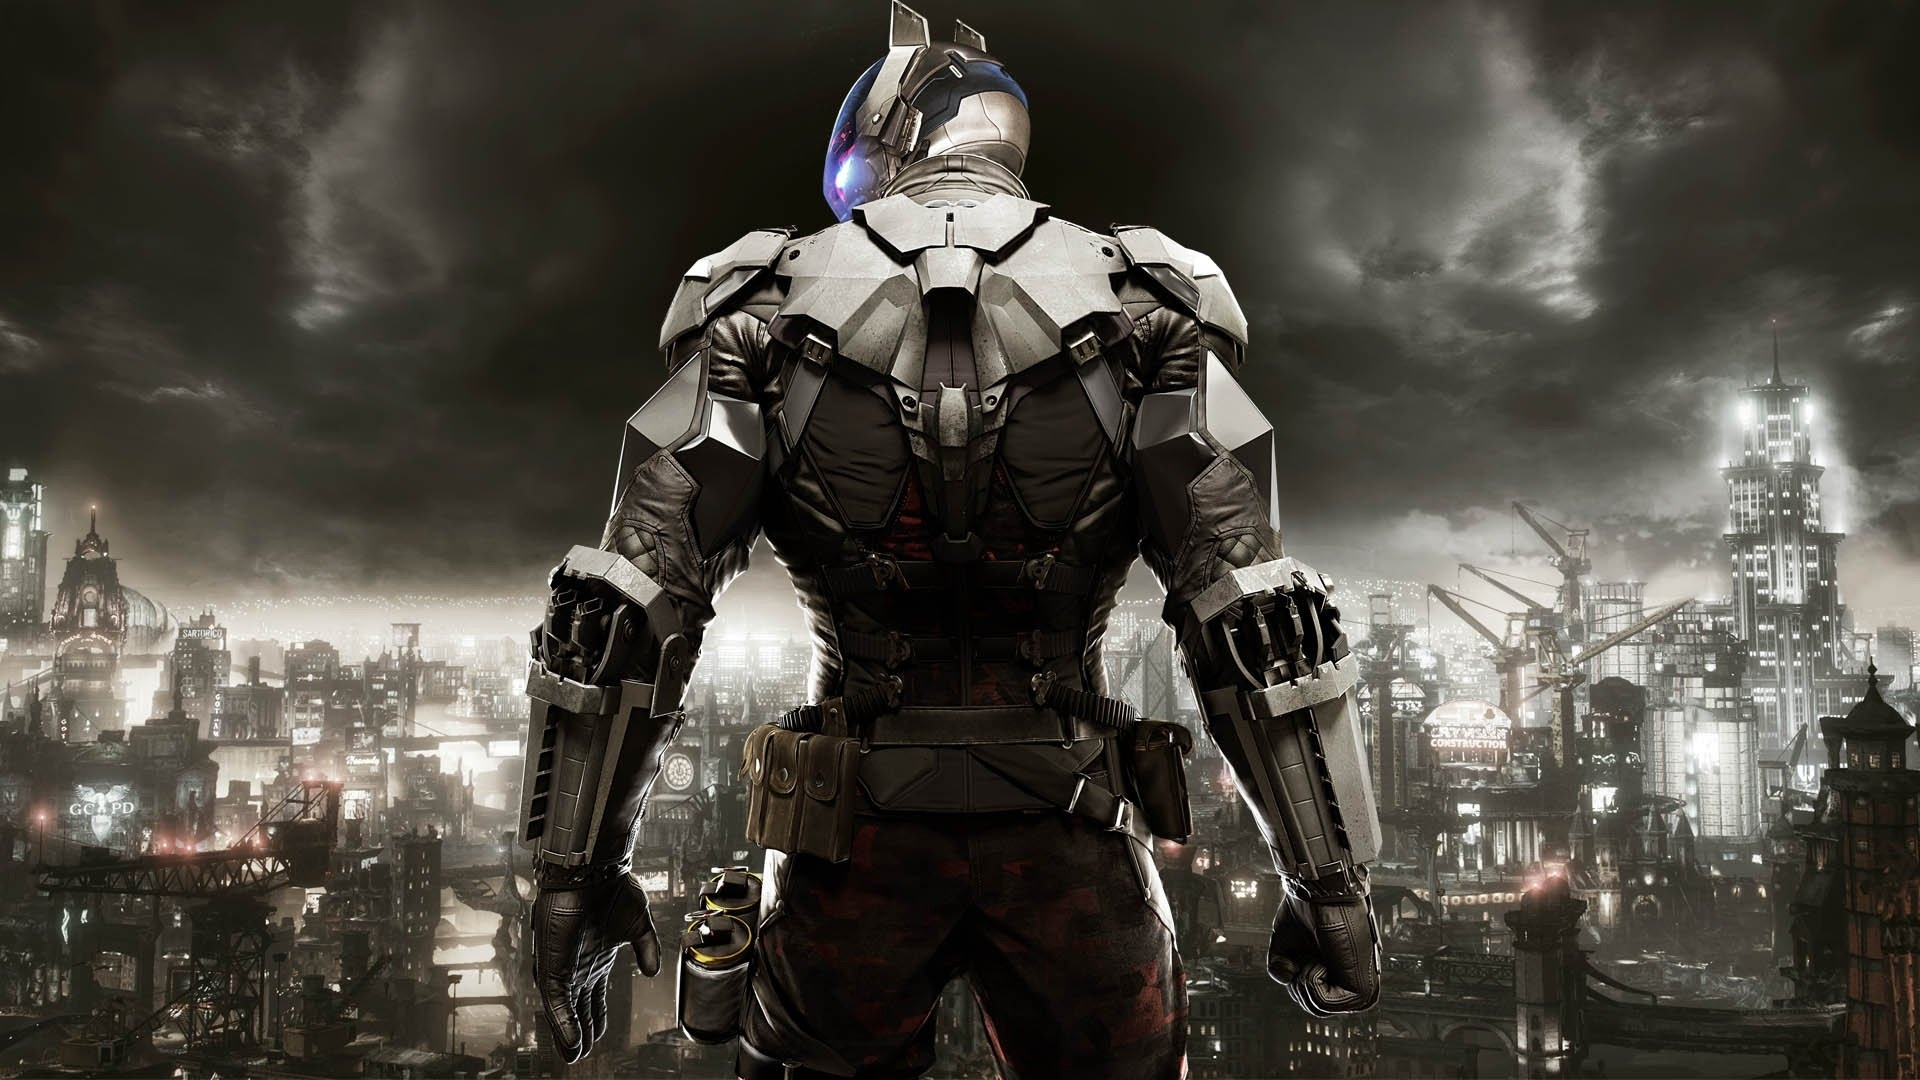 batman: arkham knight full hd fond d'écran and arrière-plan